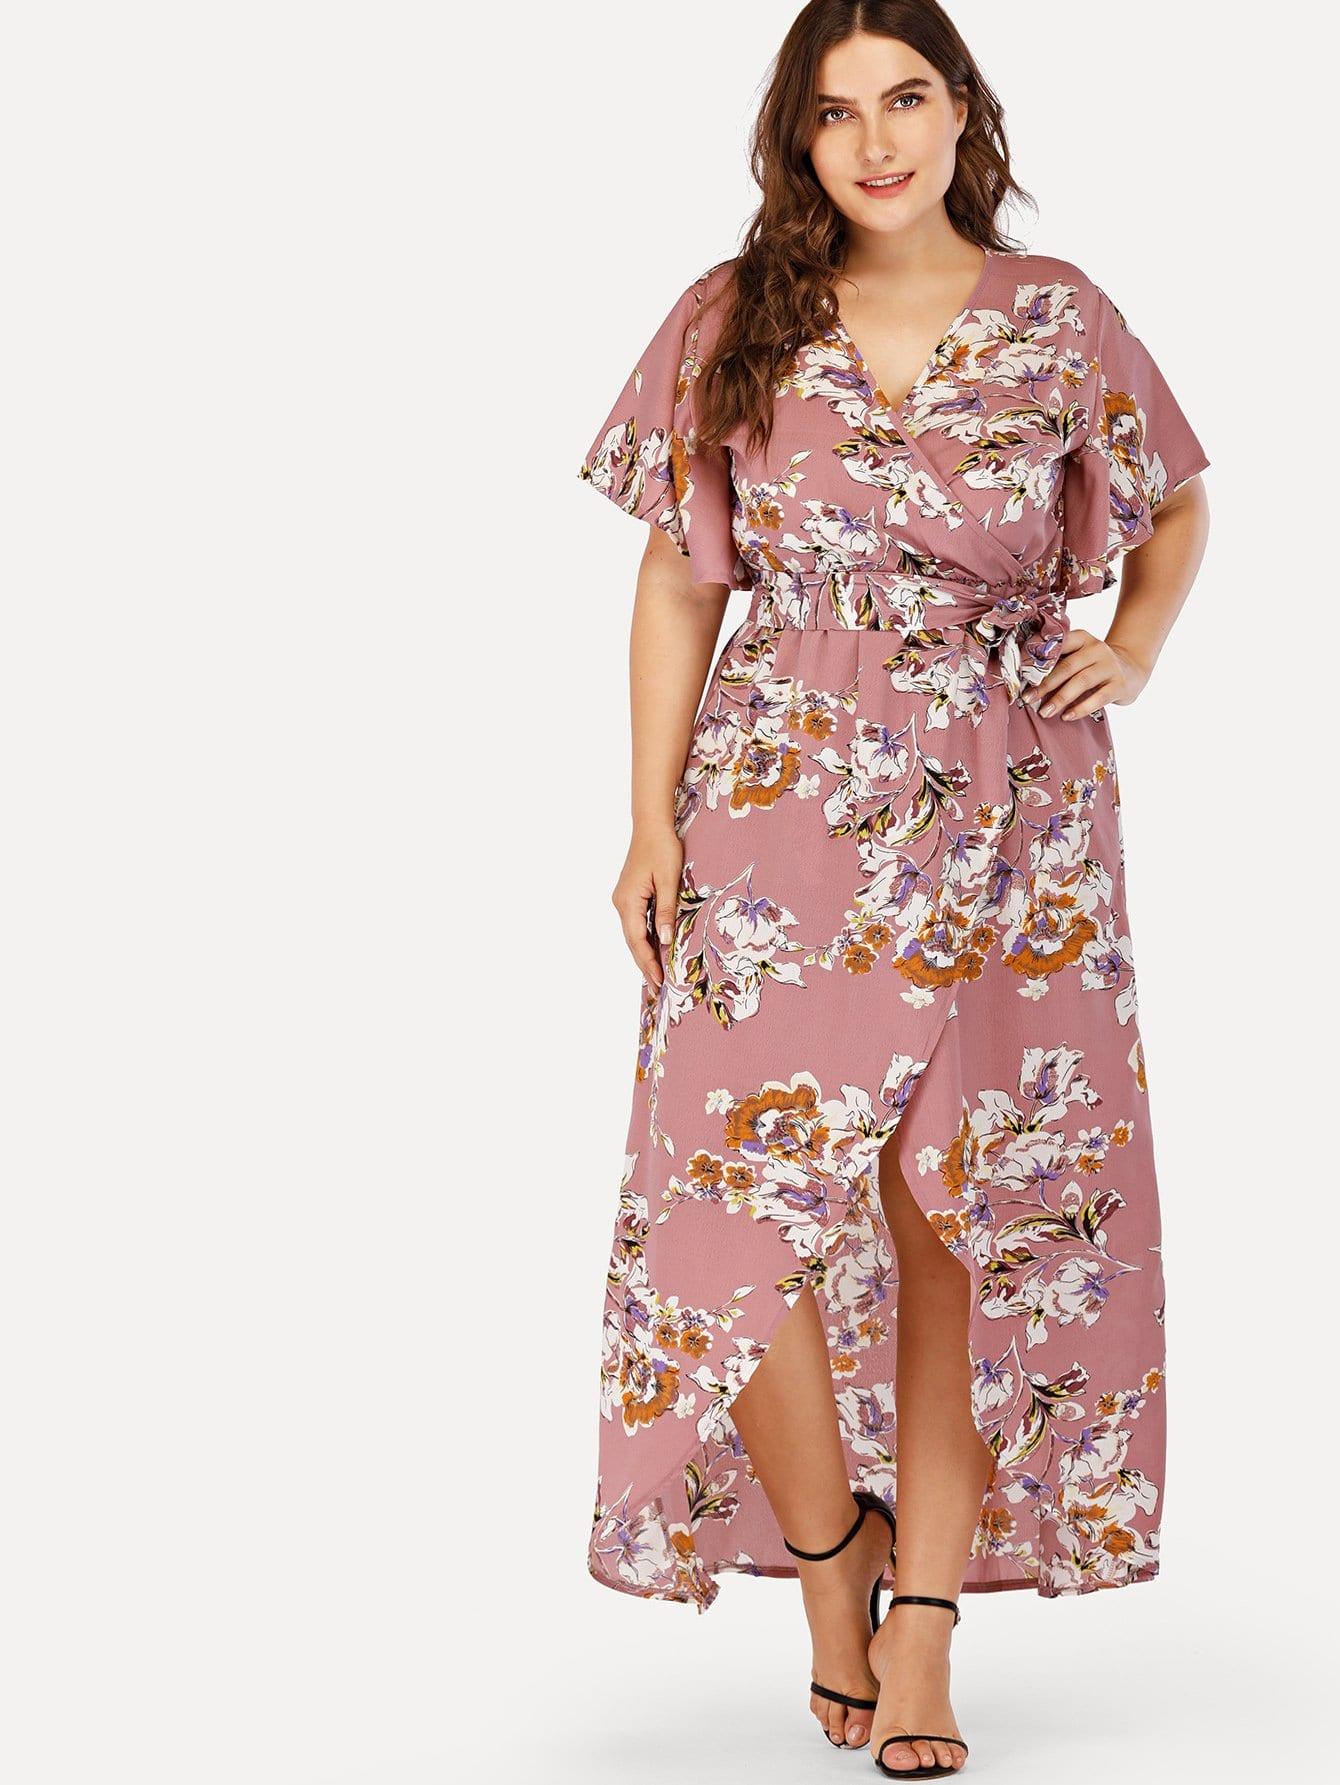 Plus Self Tie Waist Floral Print Dress self tie floral